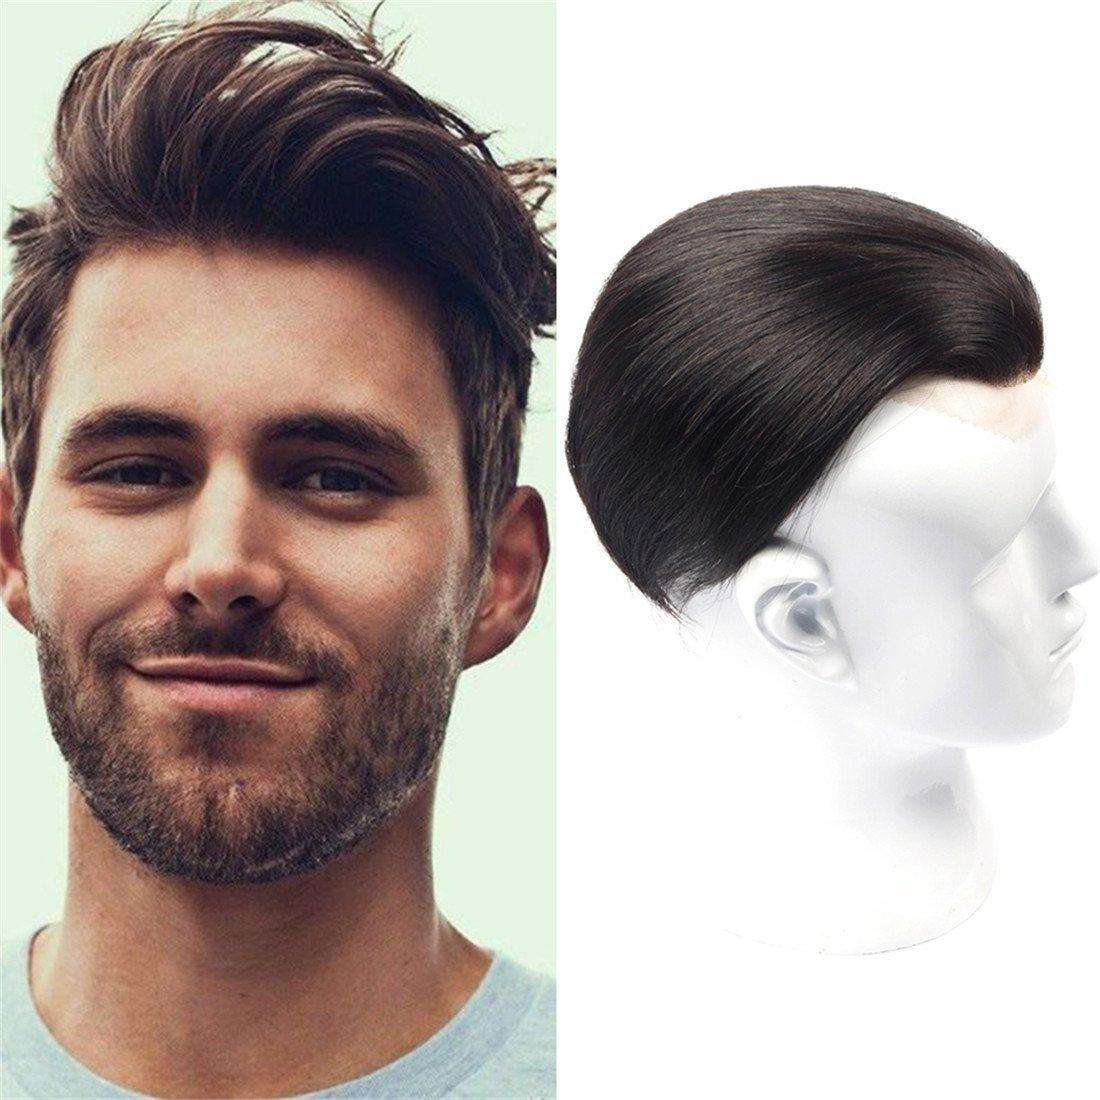 Human Hair Toupee For Men 4.4x6.8 inches Thin Skin Base Men Closure Hair Piece 100% Swiss Natural Hair Toupee (11 INCH, NATURAL COLOR)